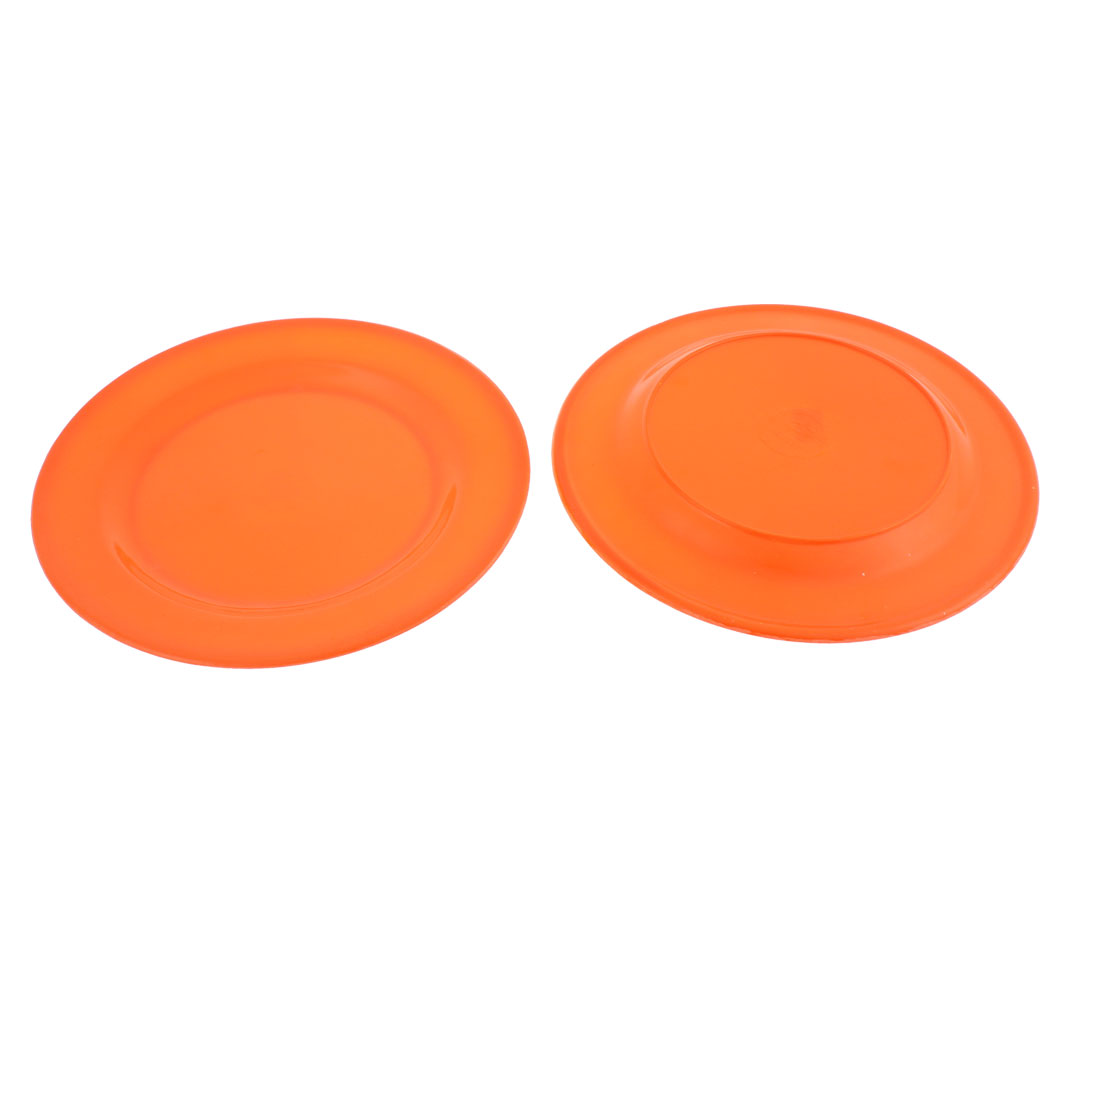 Kitchen Restaurant Round Shaped Lunch Food Dish Plate Orange 20cm Dia 2pcs